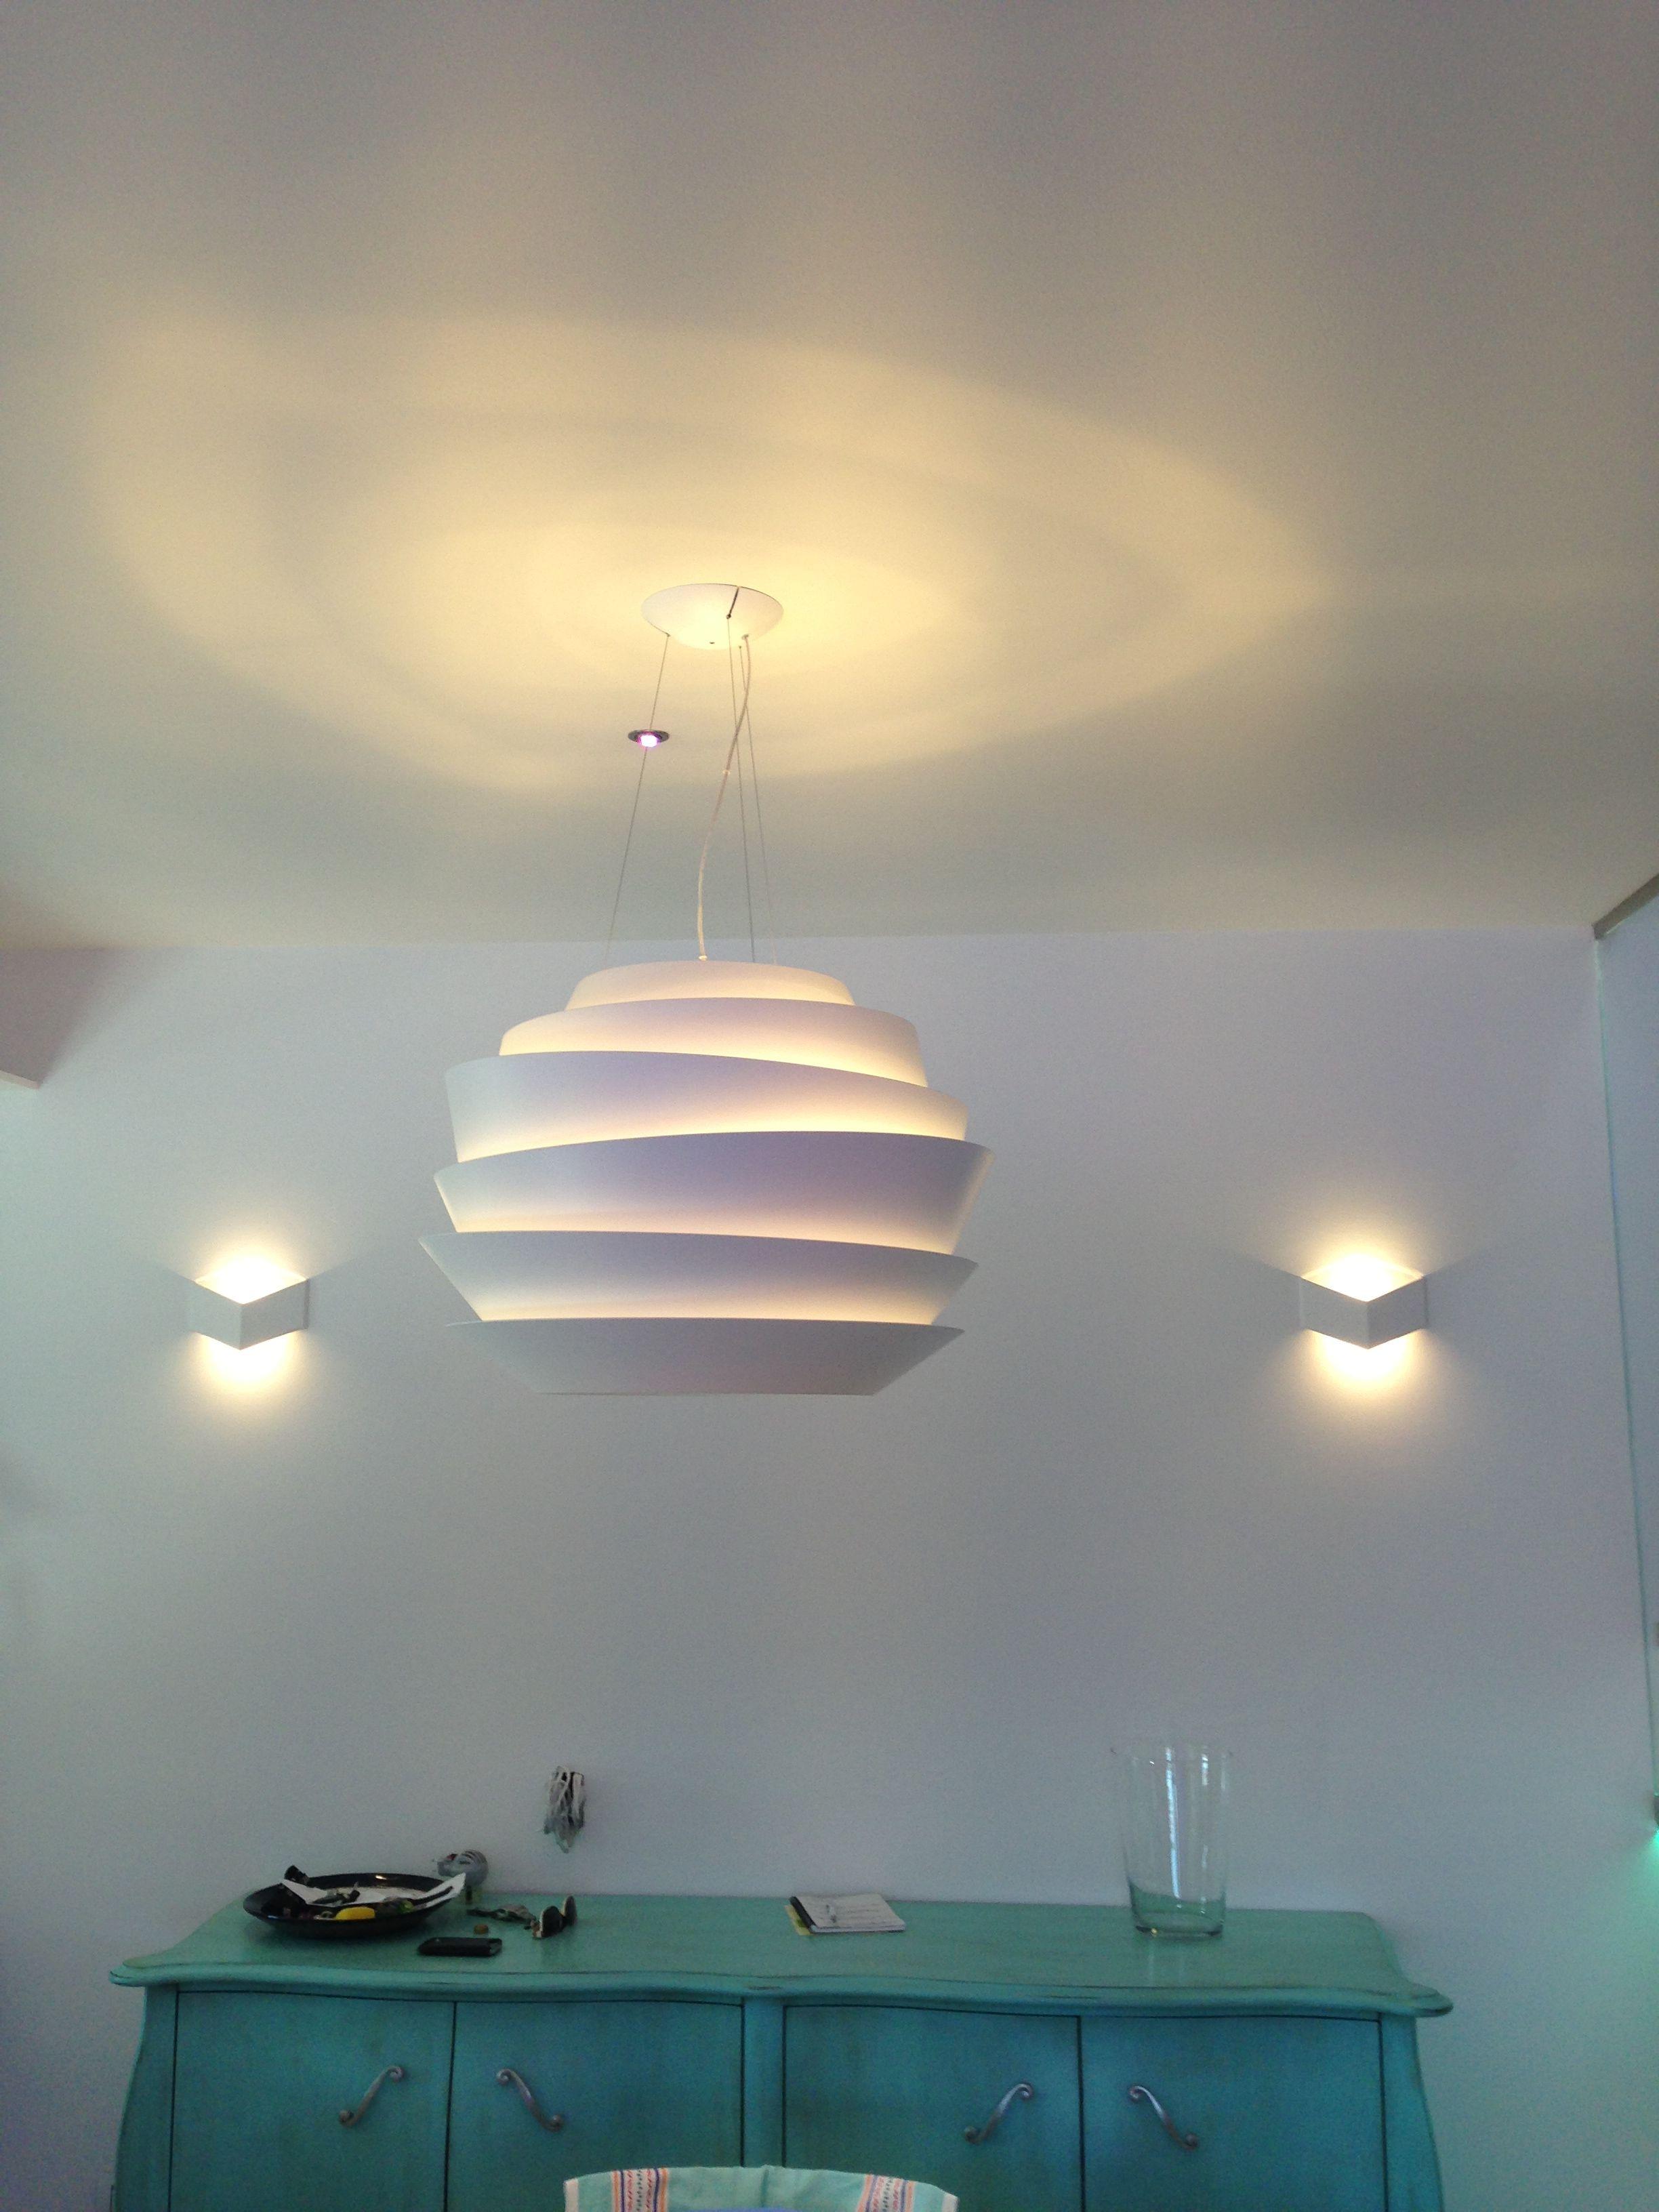 Lampadari cucina leroy merlin - Meglio luce calda o fredda in cucina ...